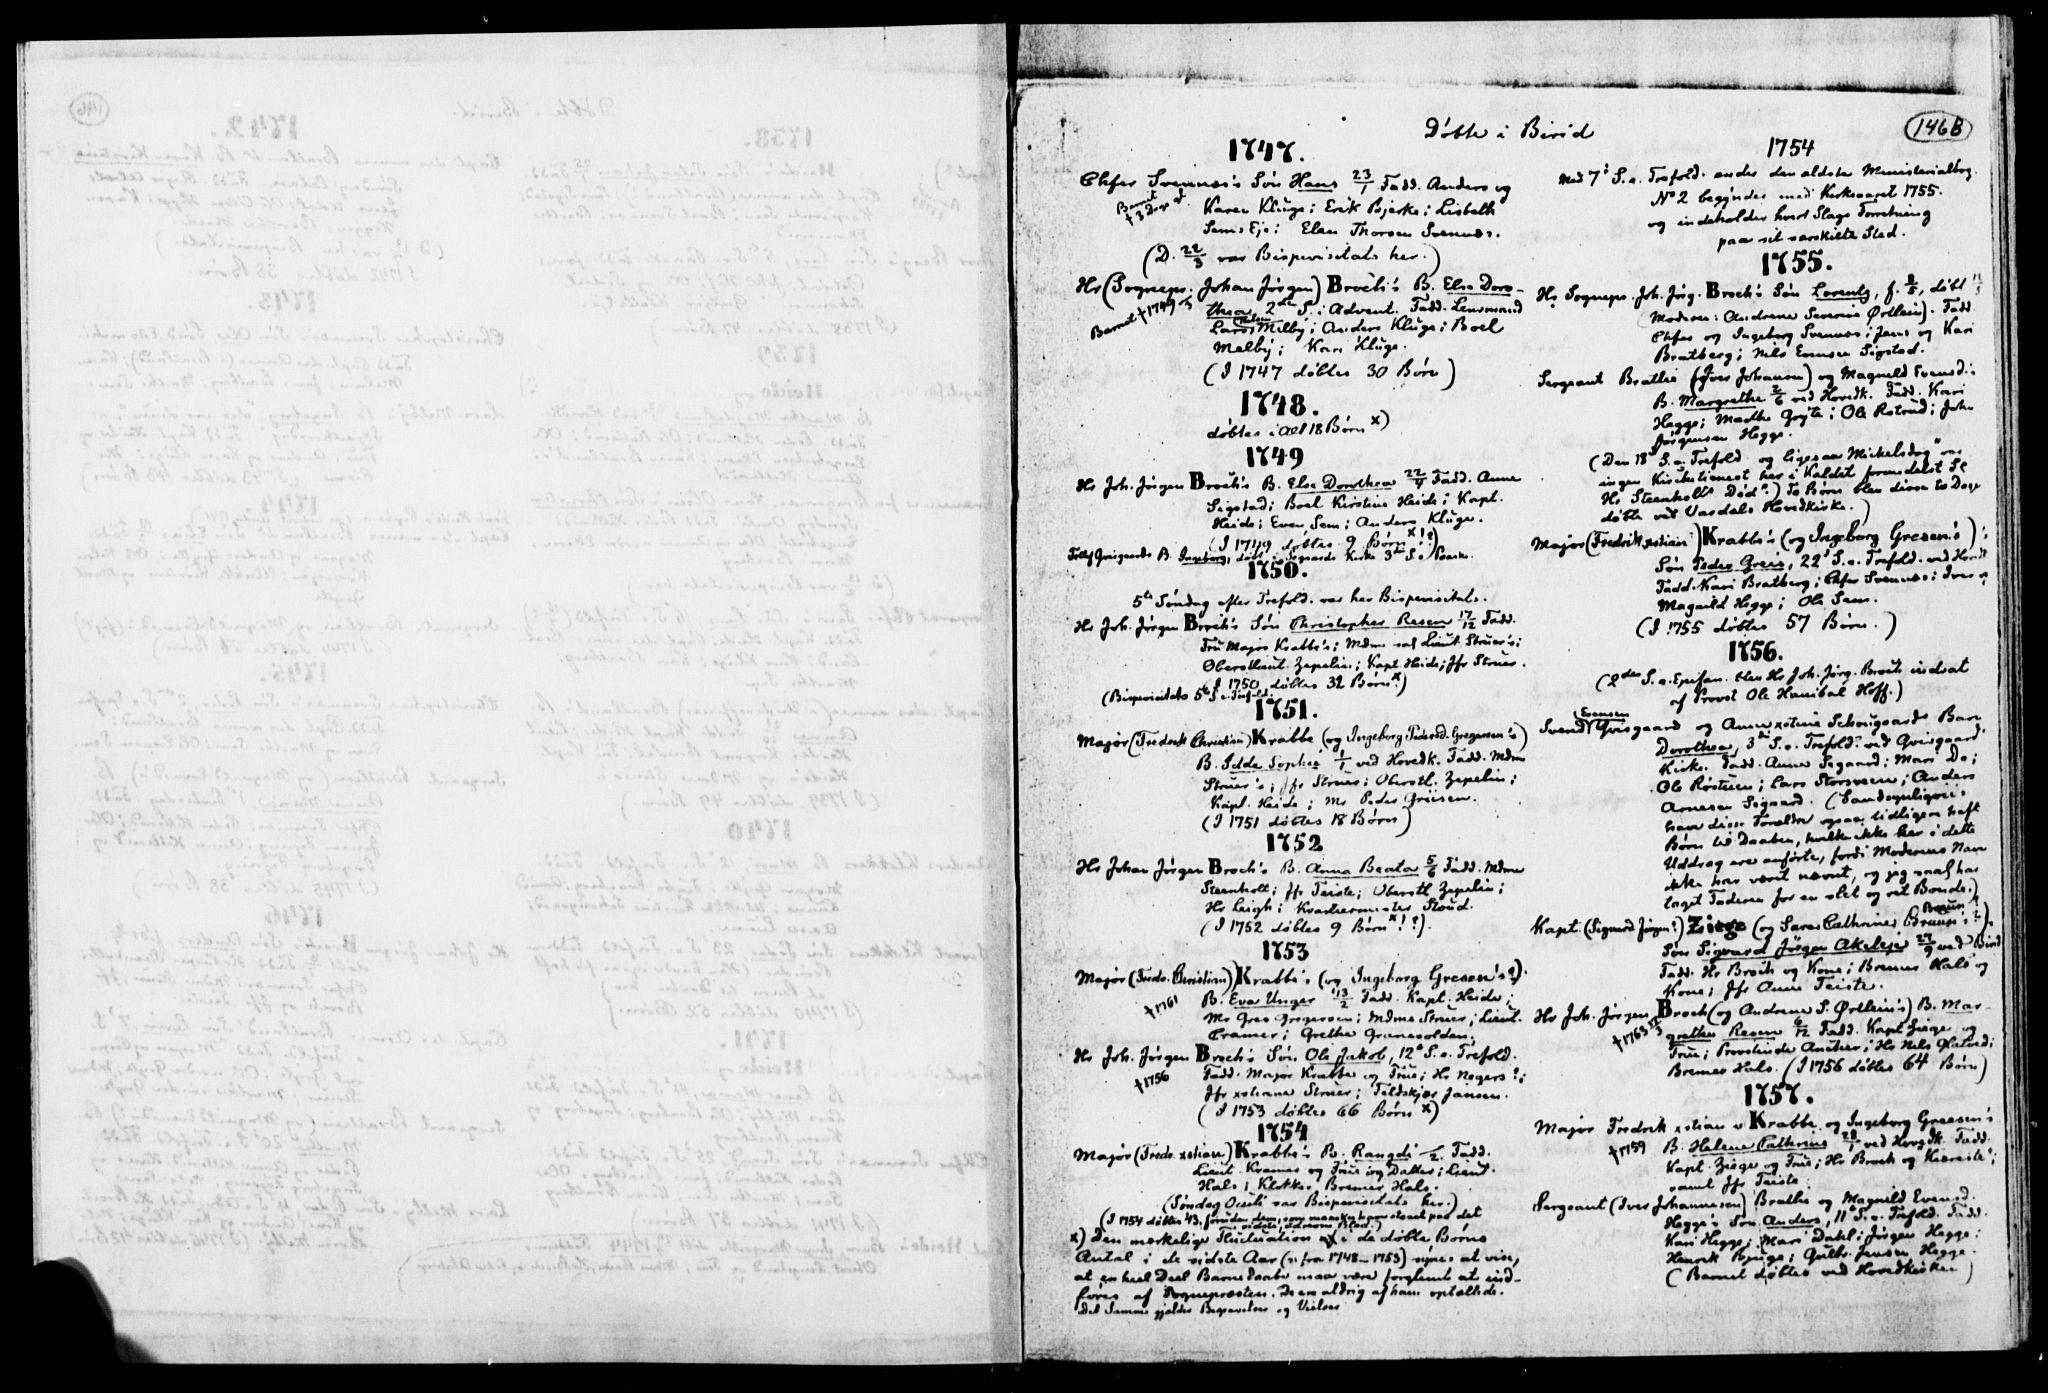 SAH, Biri prestekontor, Ministerialbok, 1730-1879, s. 146b